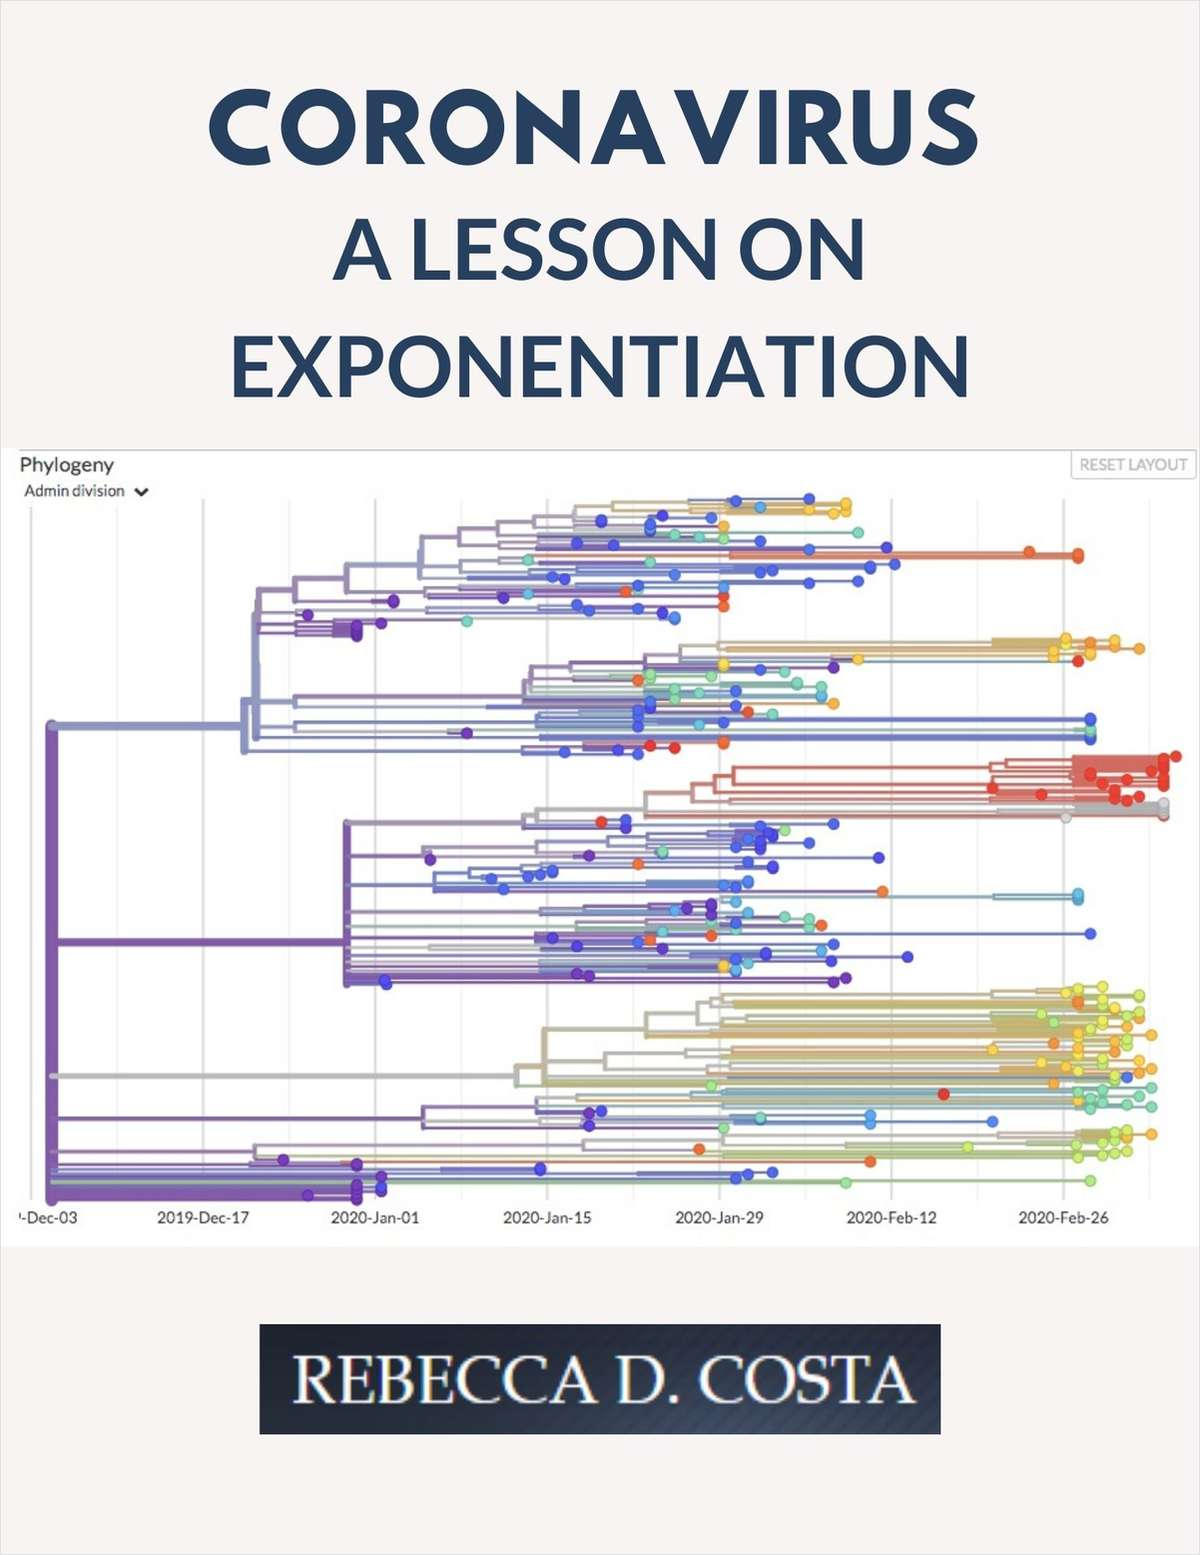 Coronavirus: A Lesson on Exponentiation